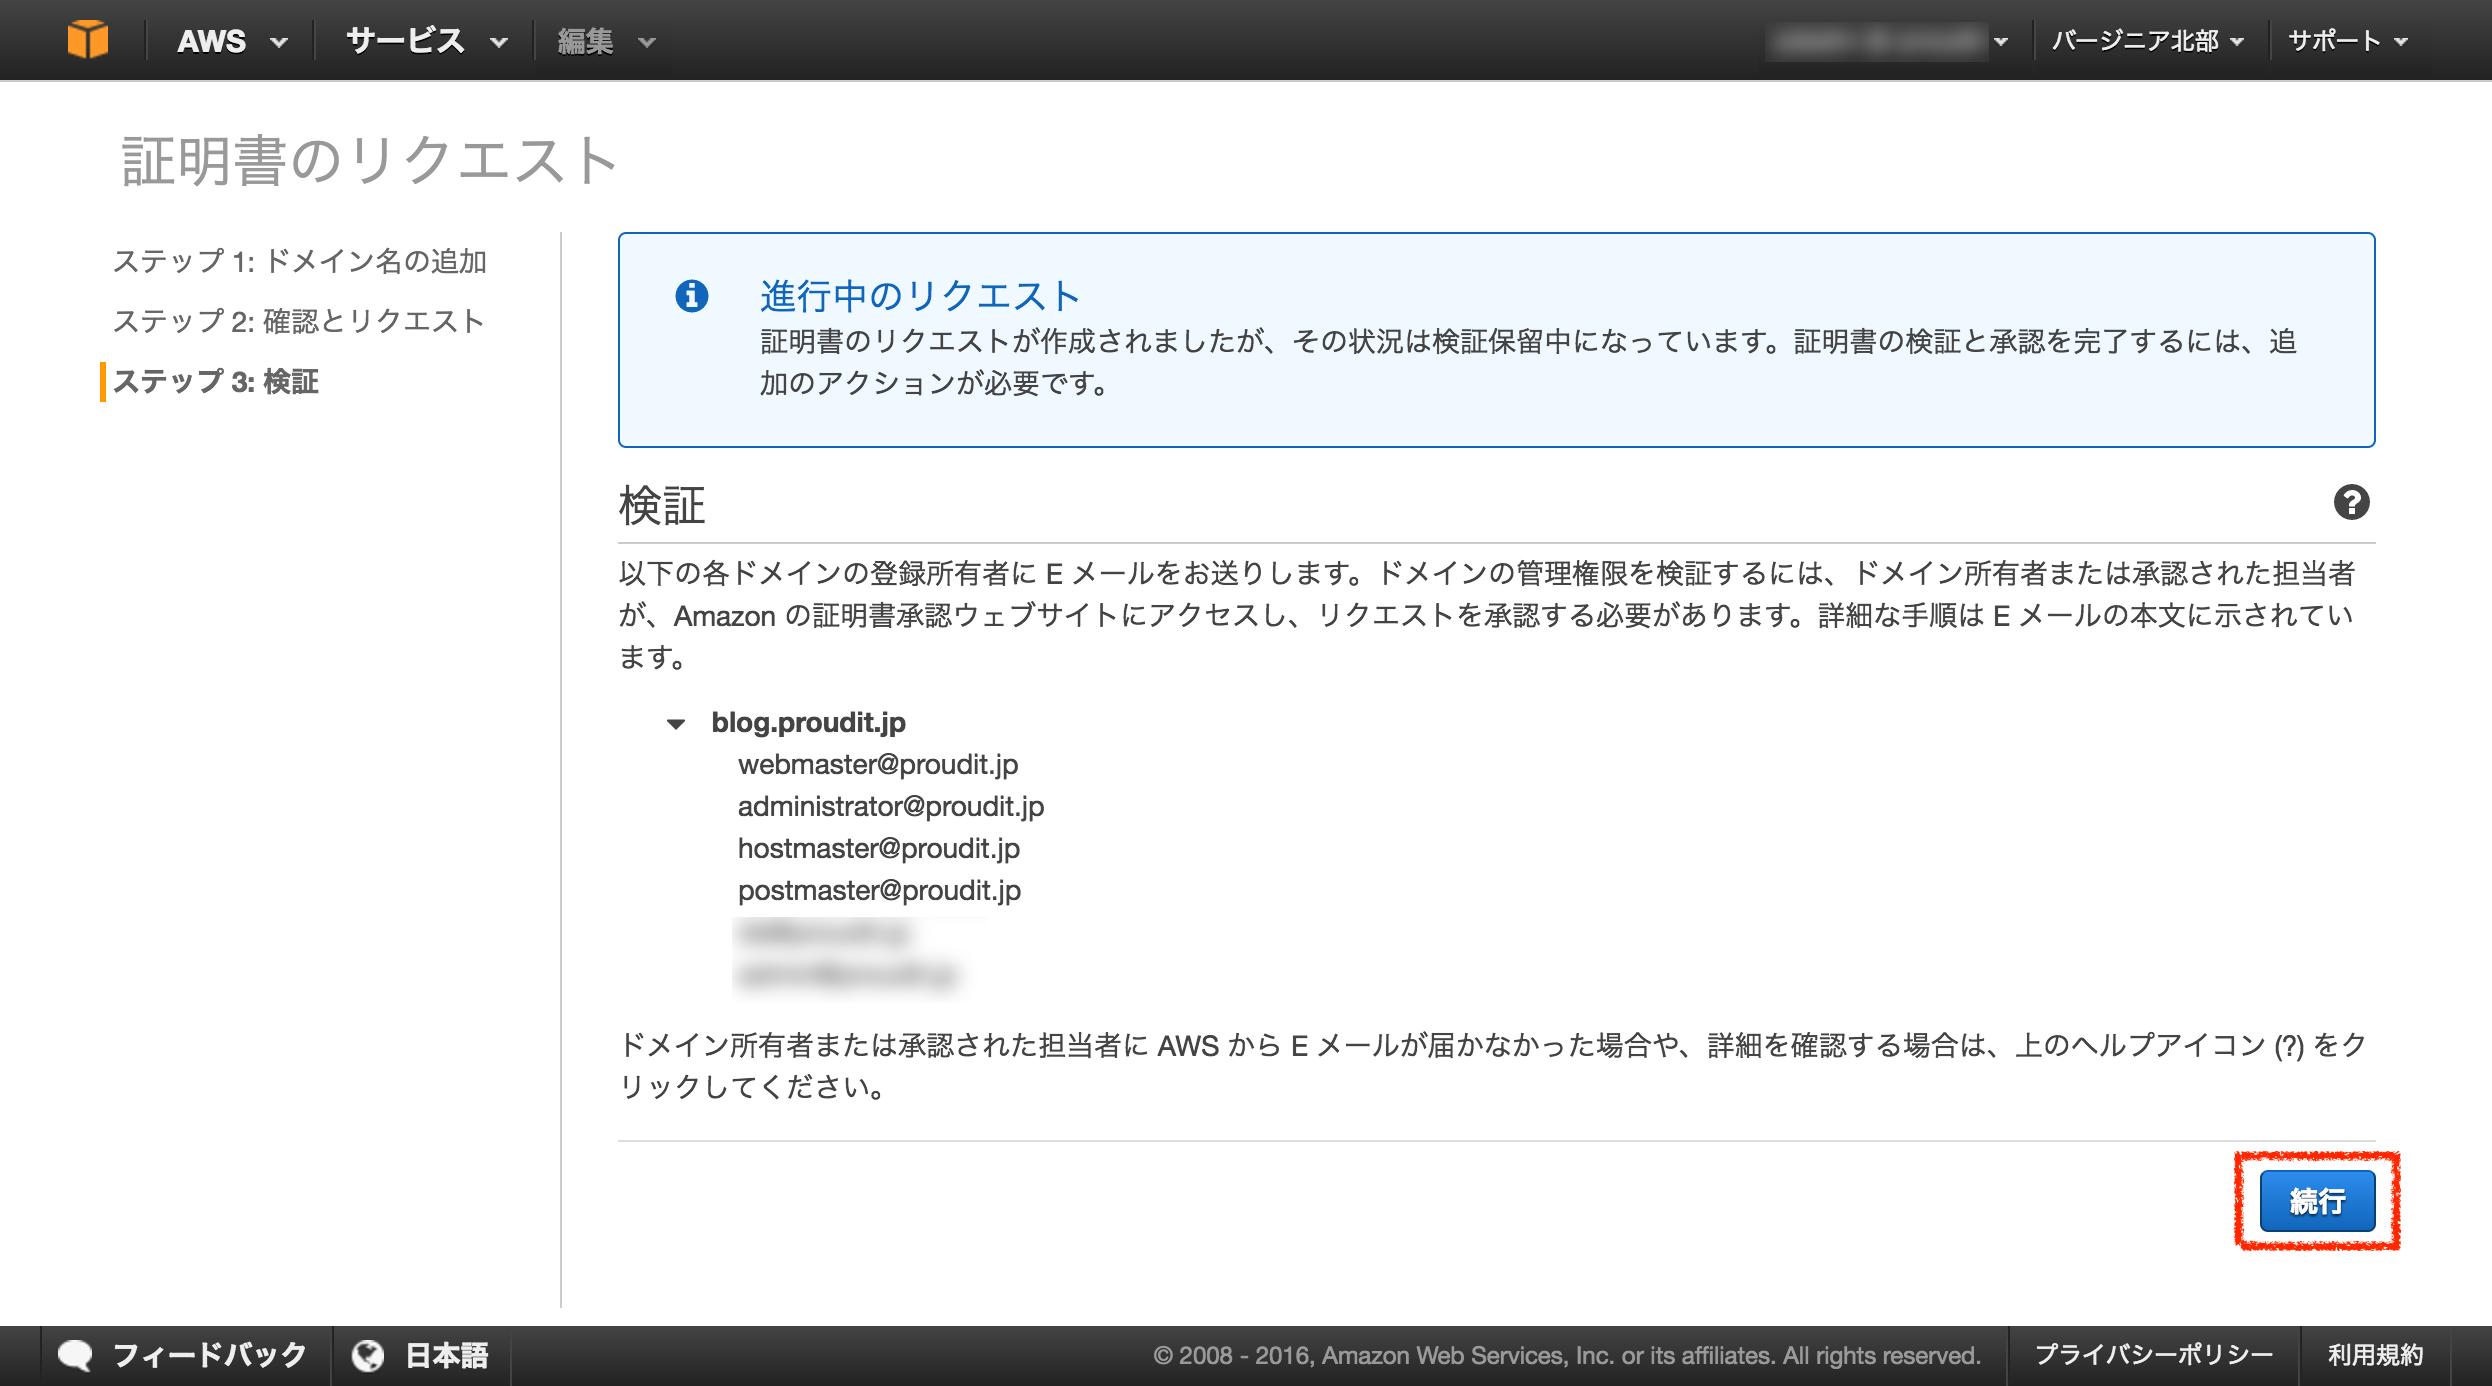 01_CertificatedManager05.png